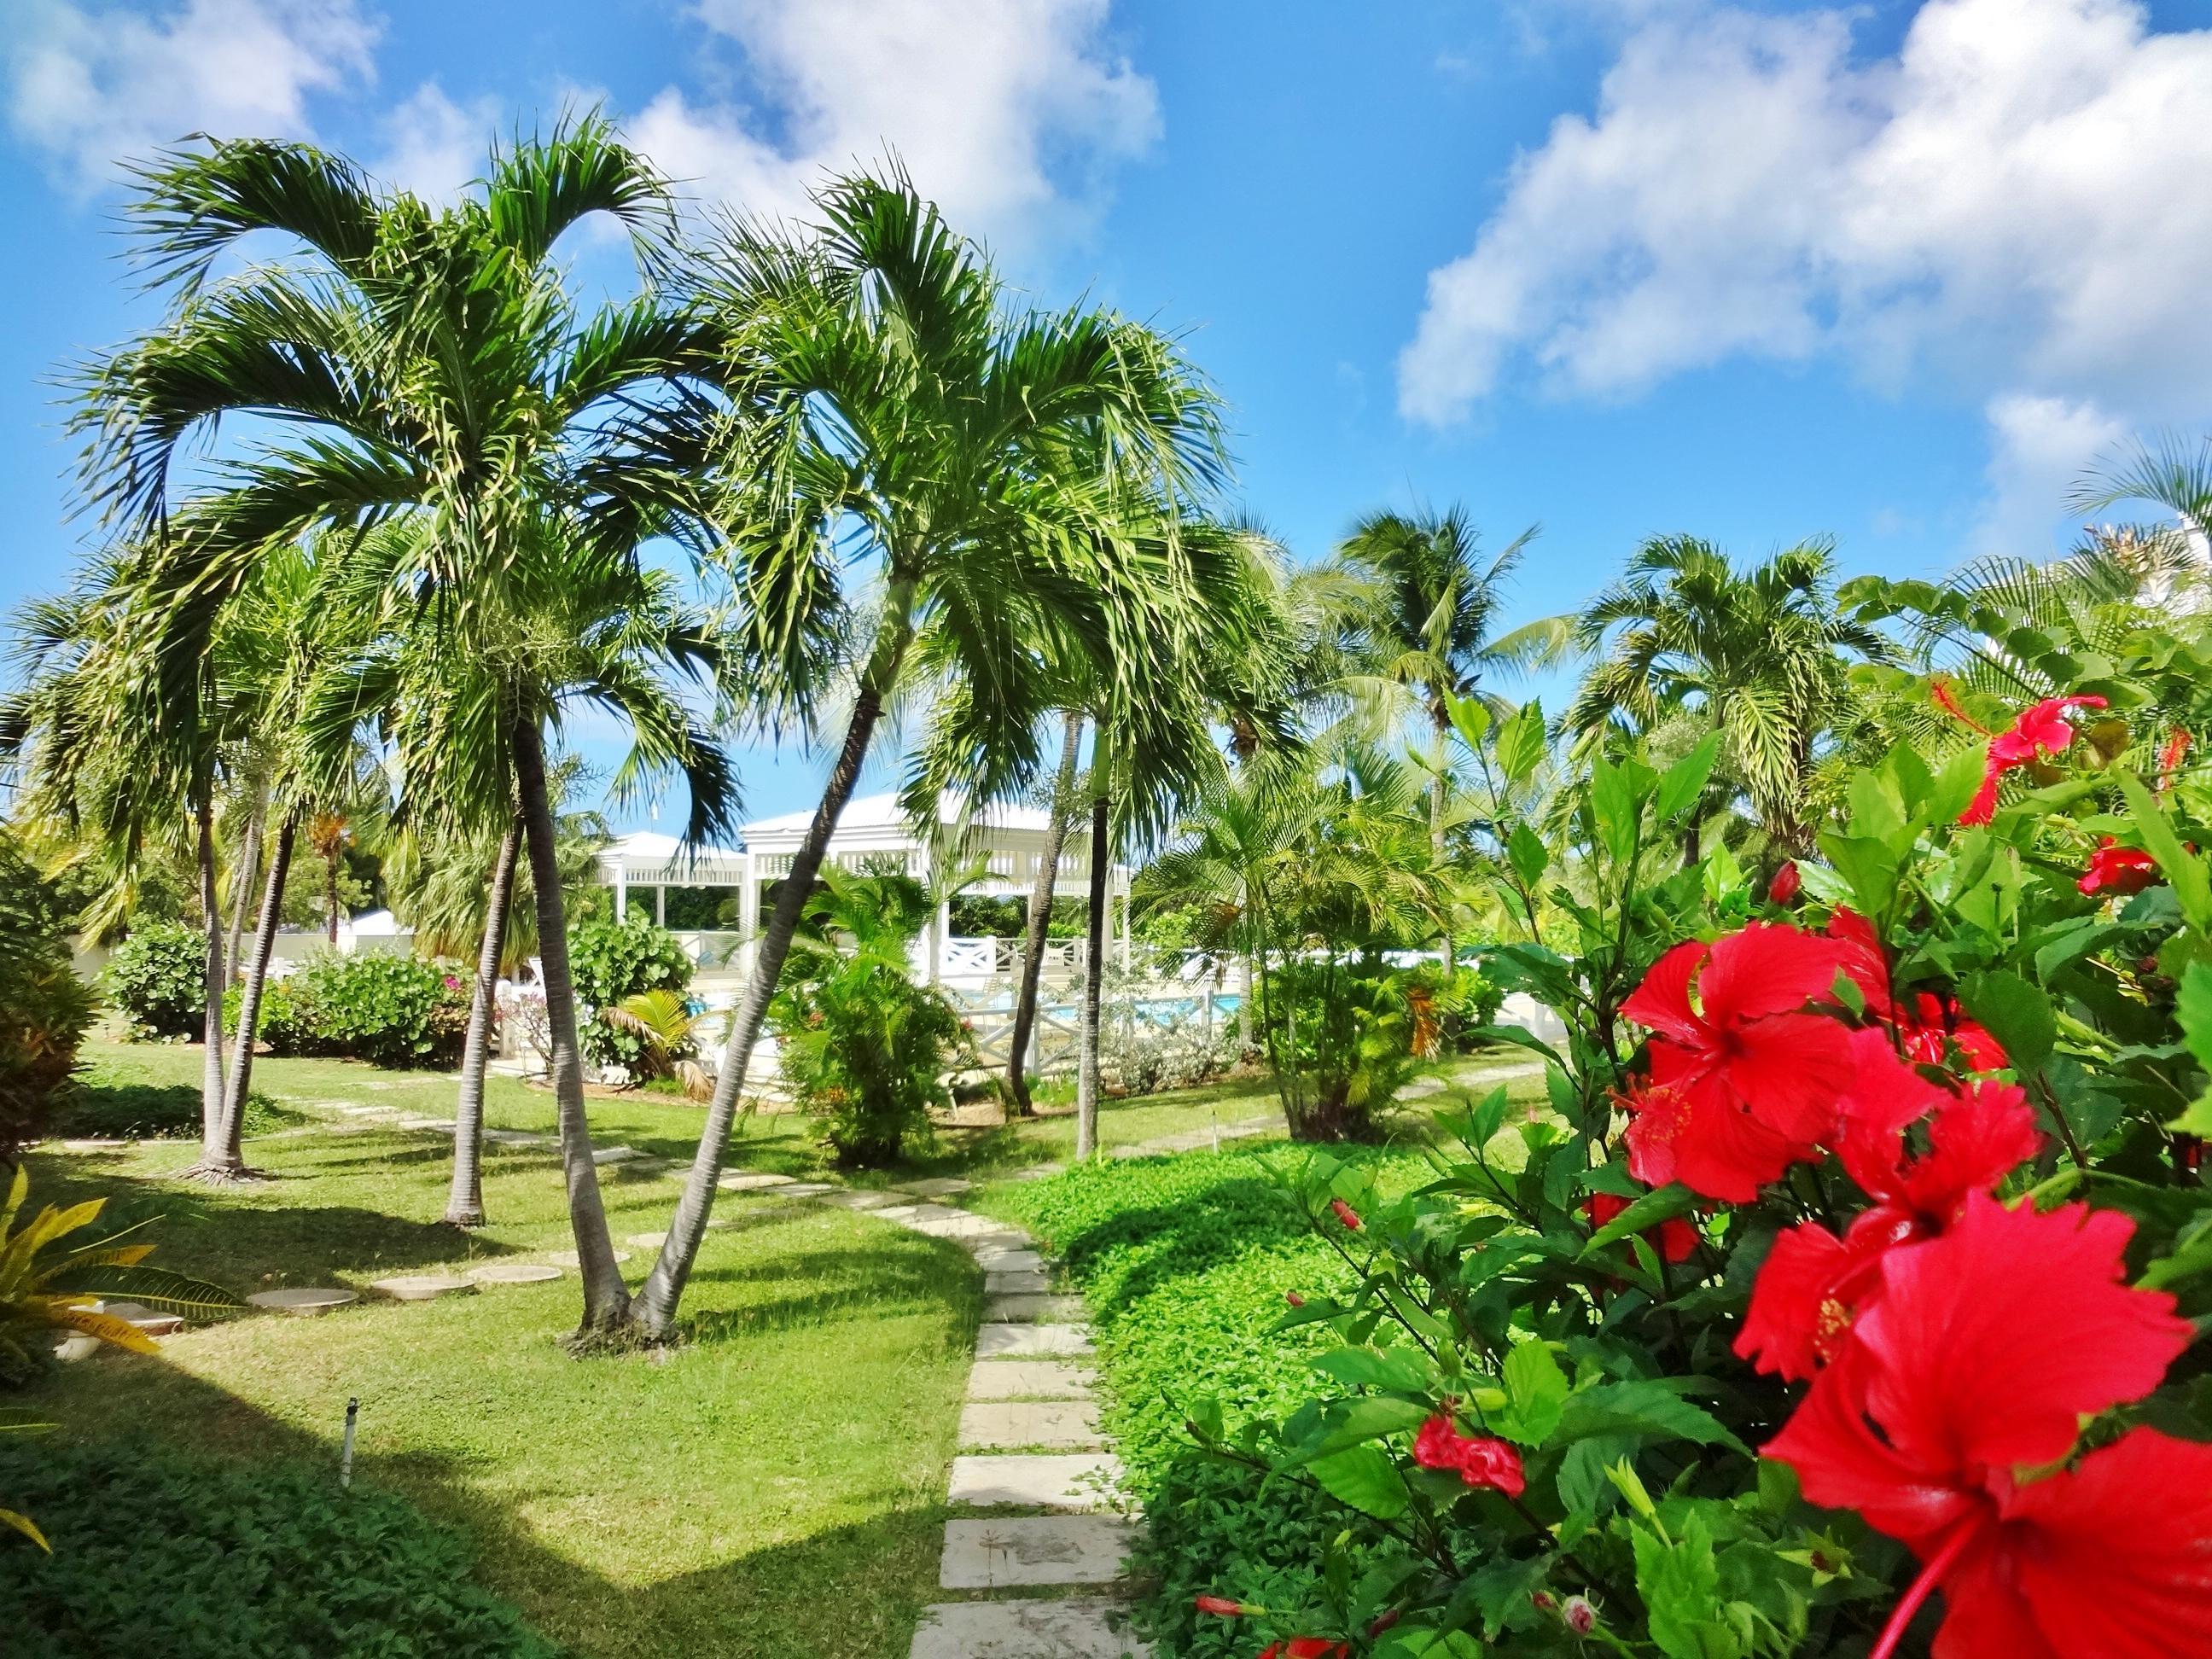 Exotic Landscaping Lines Walkways